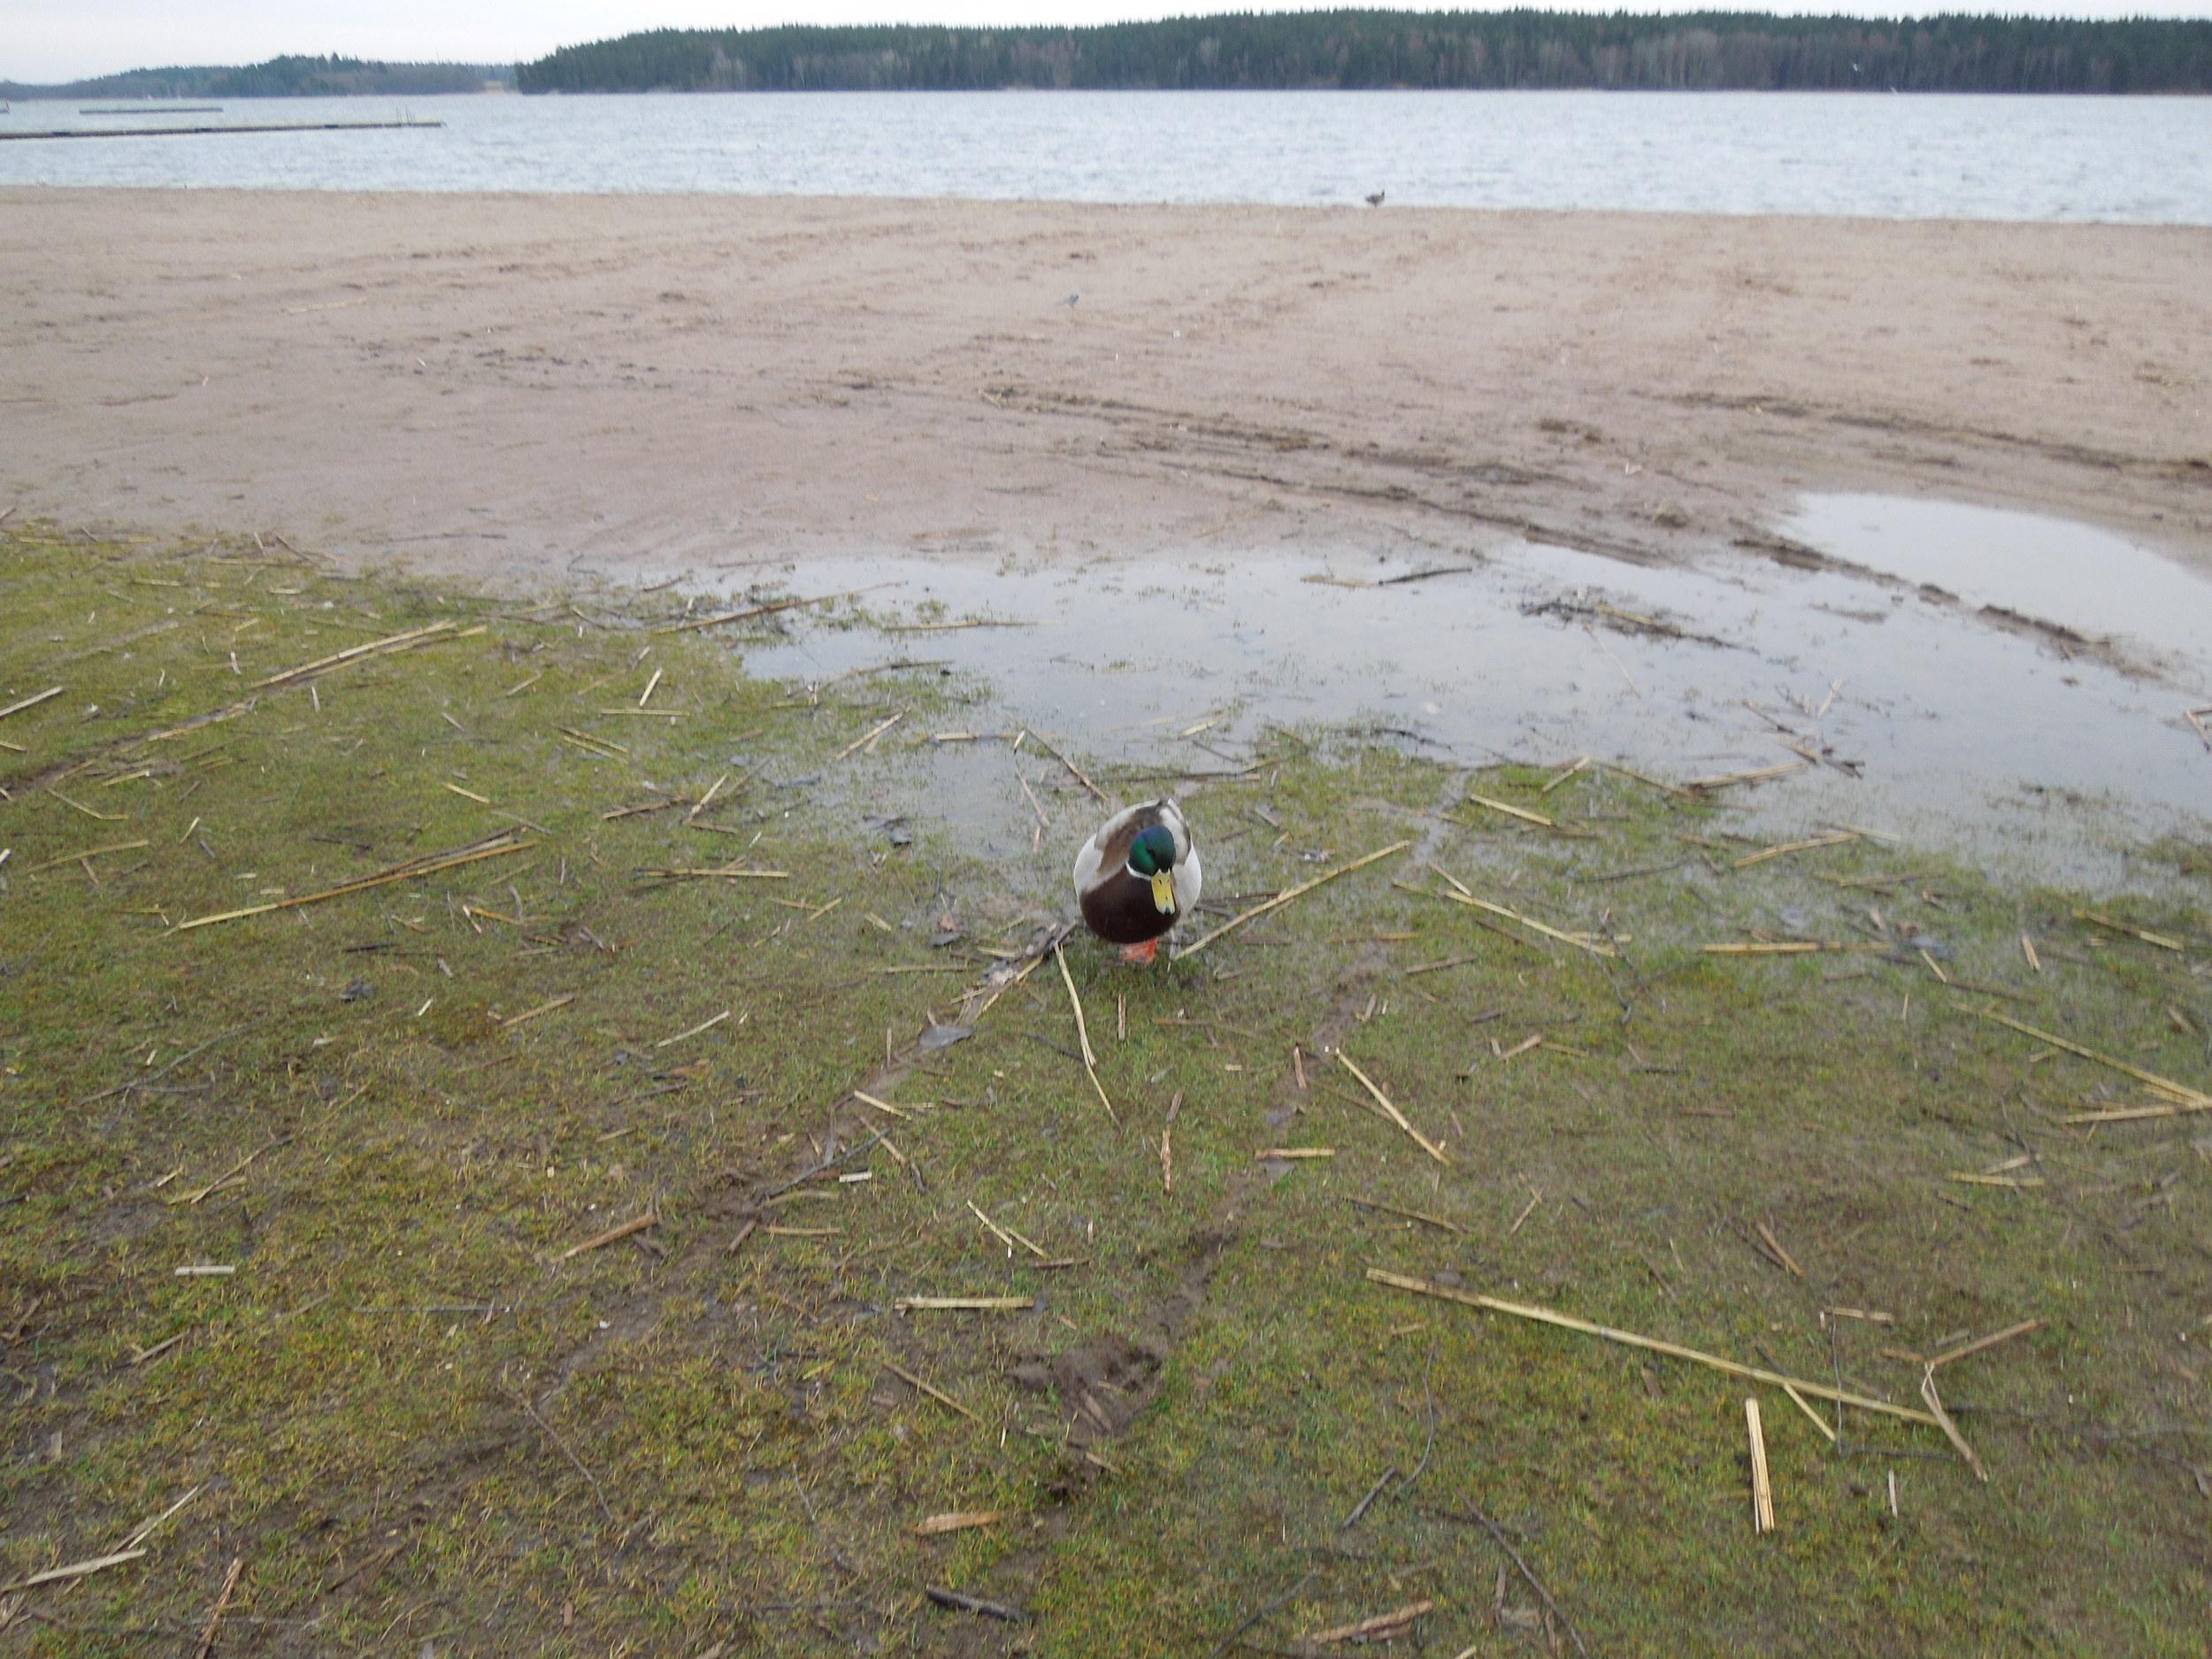 My buddy at the beach